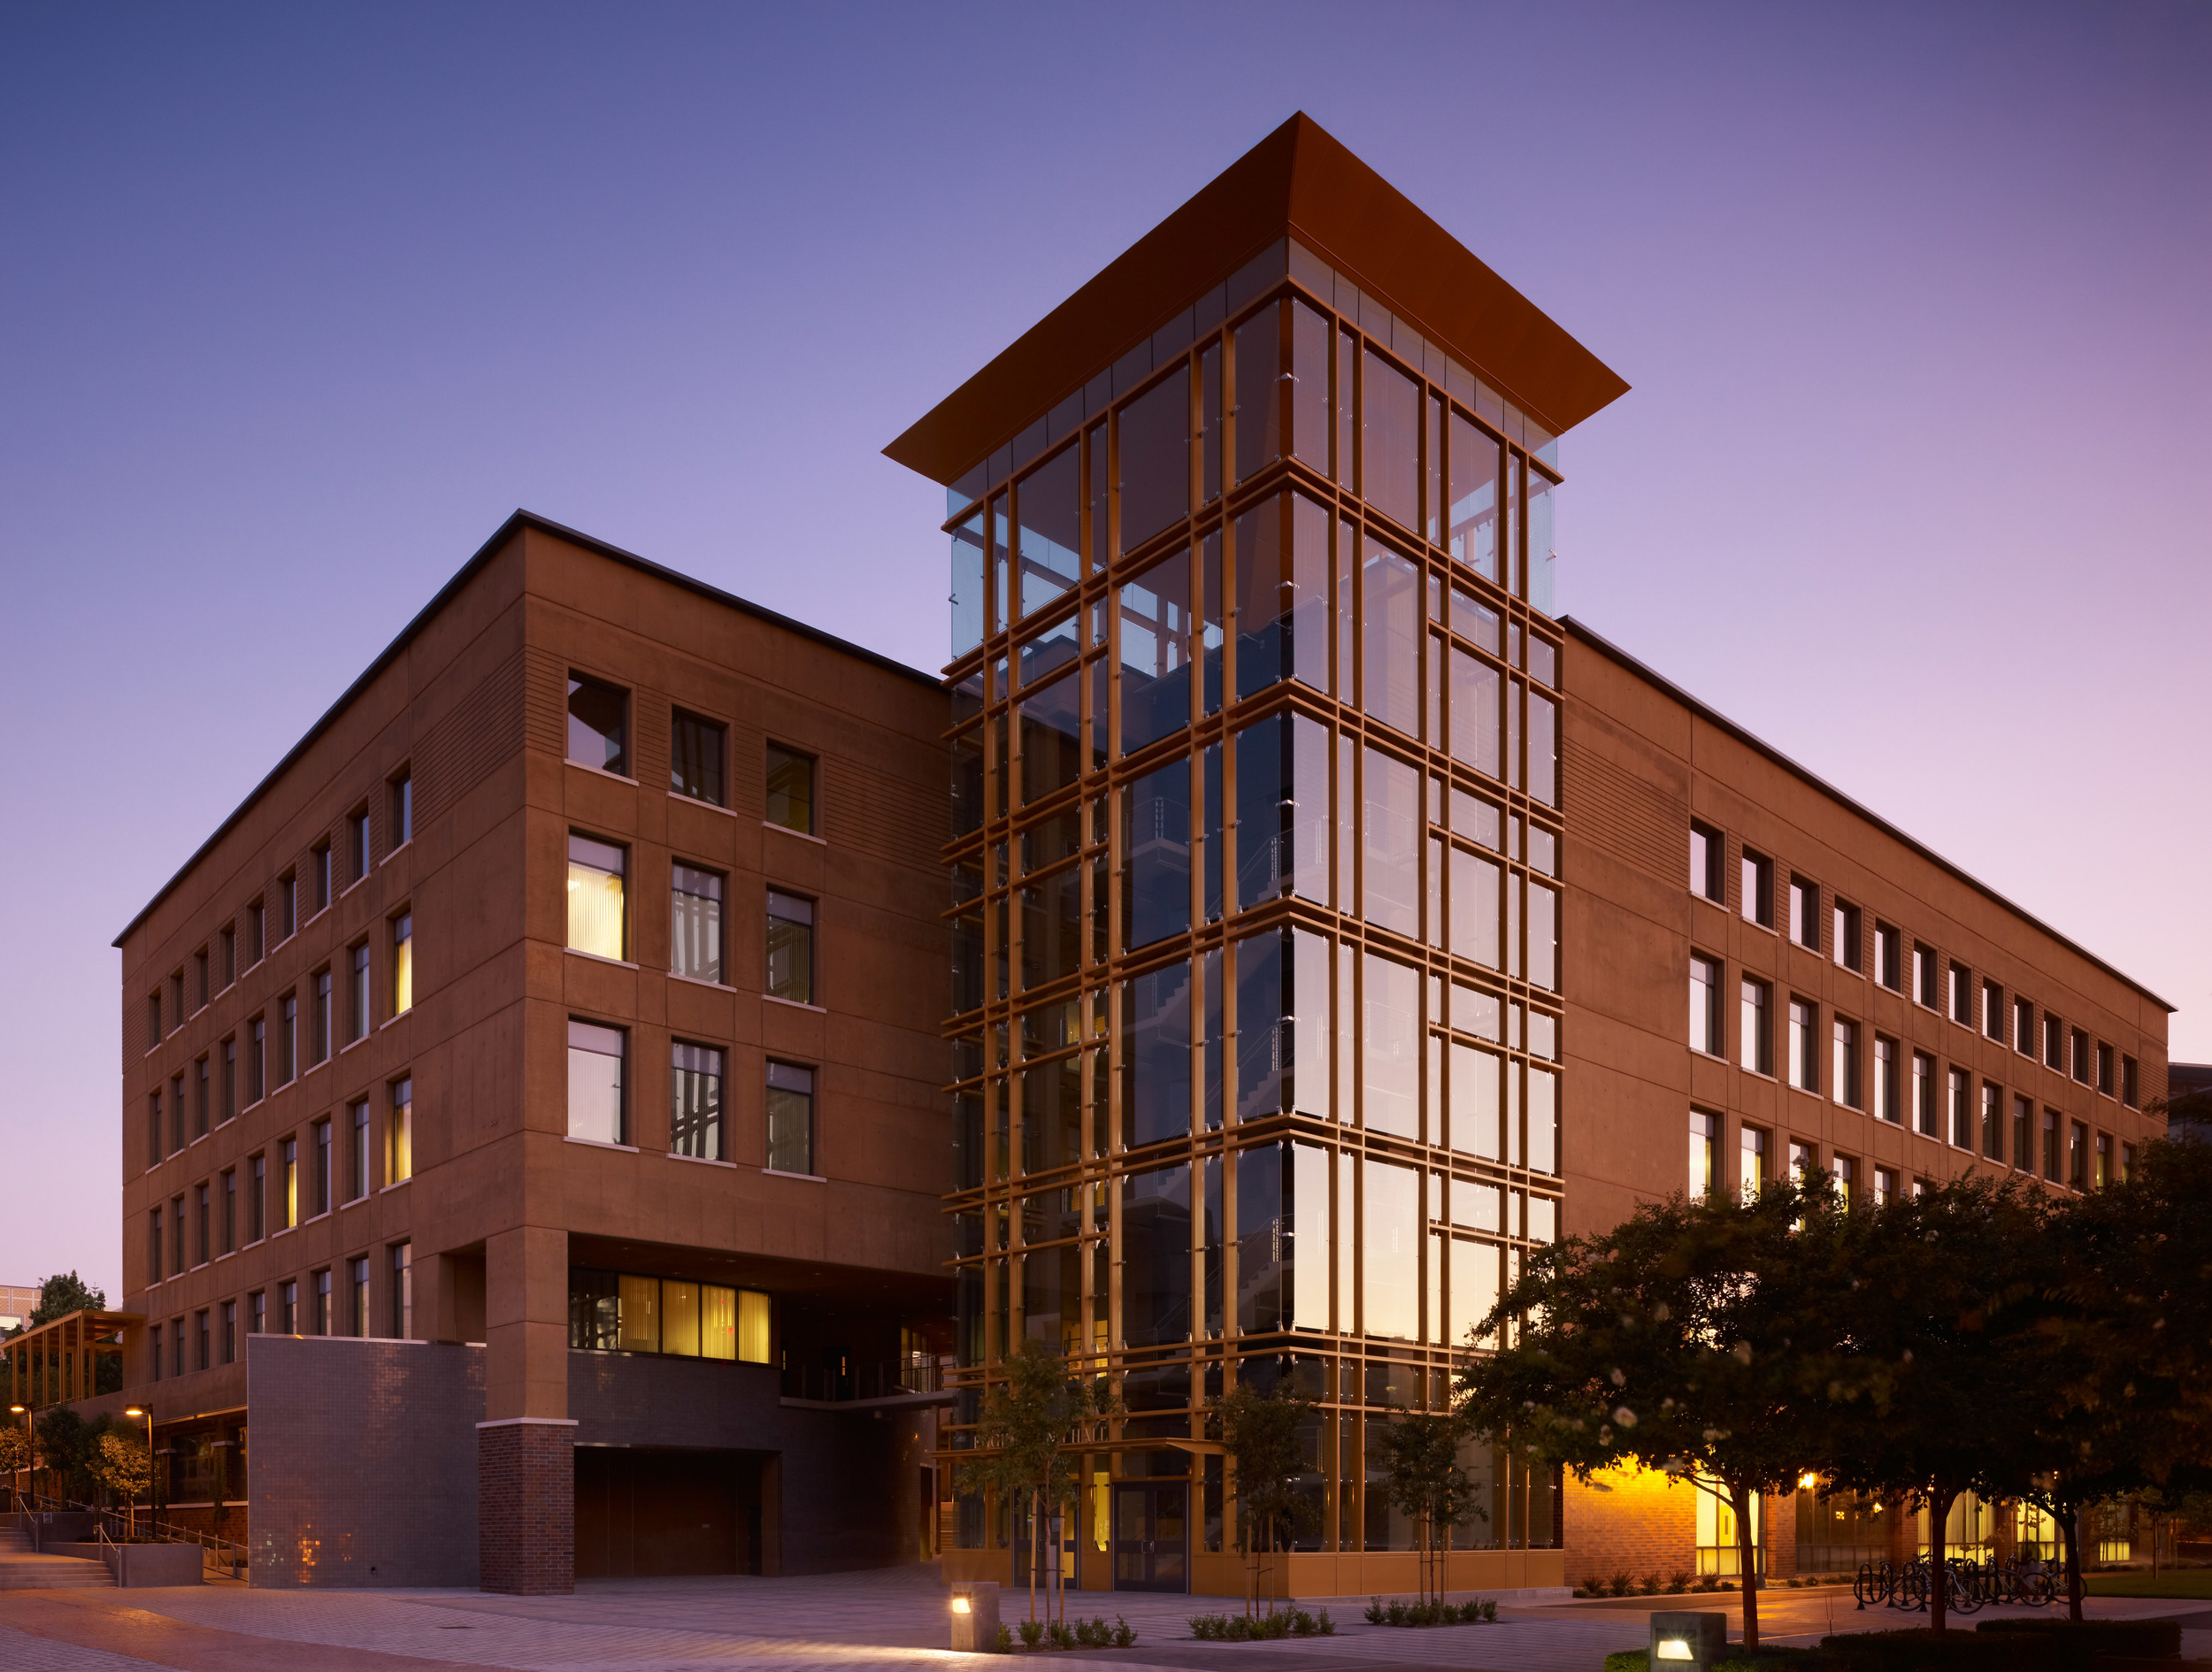 UC Irvine Engineering Hall - LEED GOLD